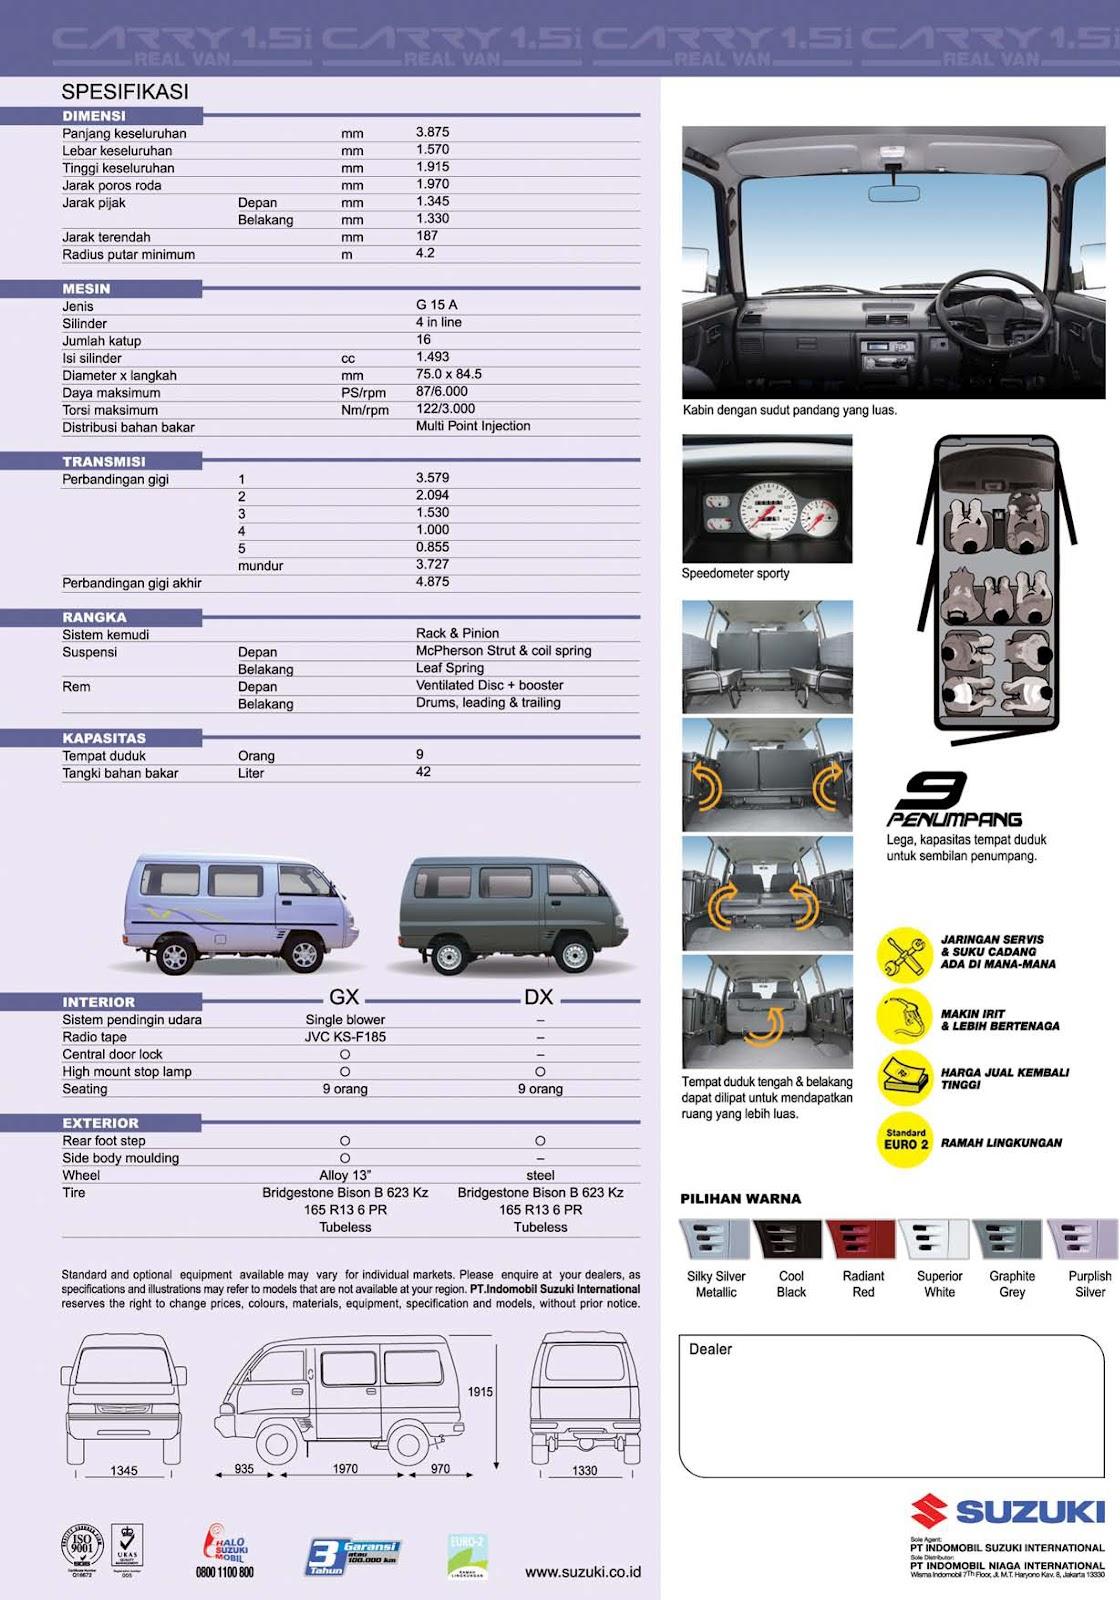 ulasan grand new veloz 1.3 mt keunggulan kekurangan suzuki carry futura 1.5 harga ...